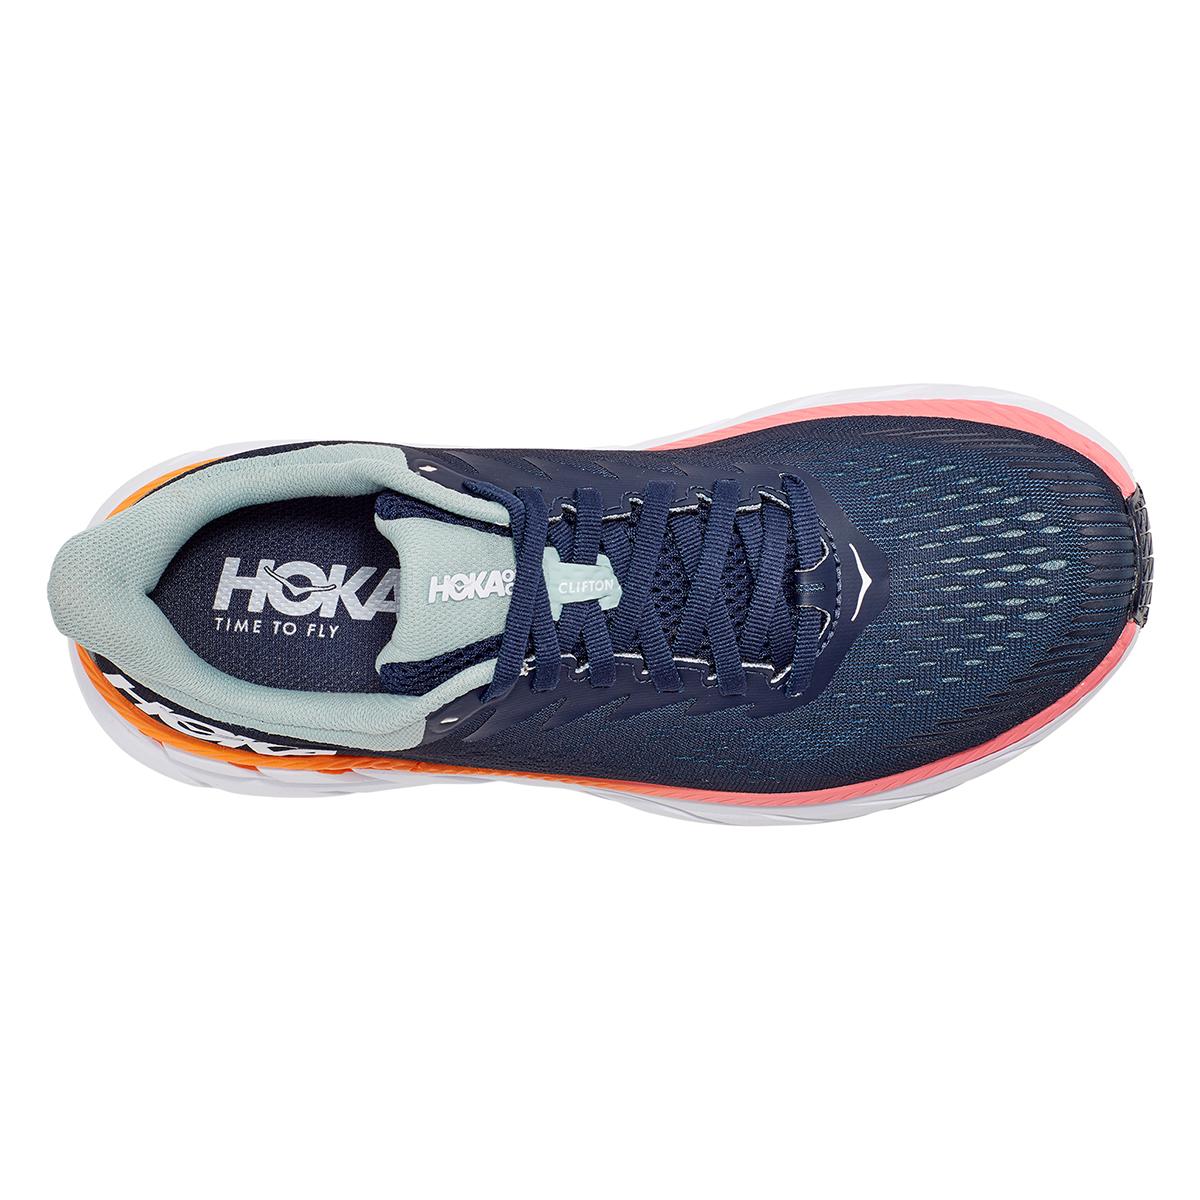 Women's Hoka One One Clifton 7 Running Shoe - Color: Black Iris/Blue Haze - Size: 6 - Width: Regular, Black Iris/Blue Haze, large, image 2